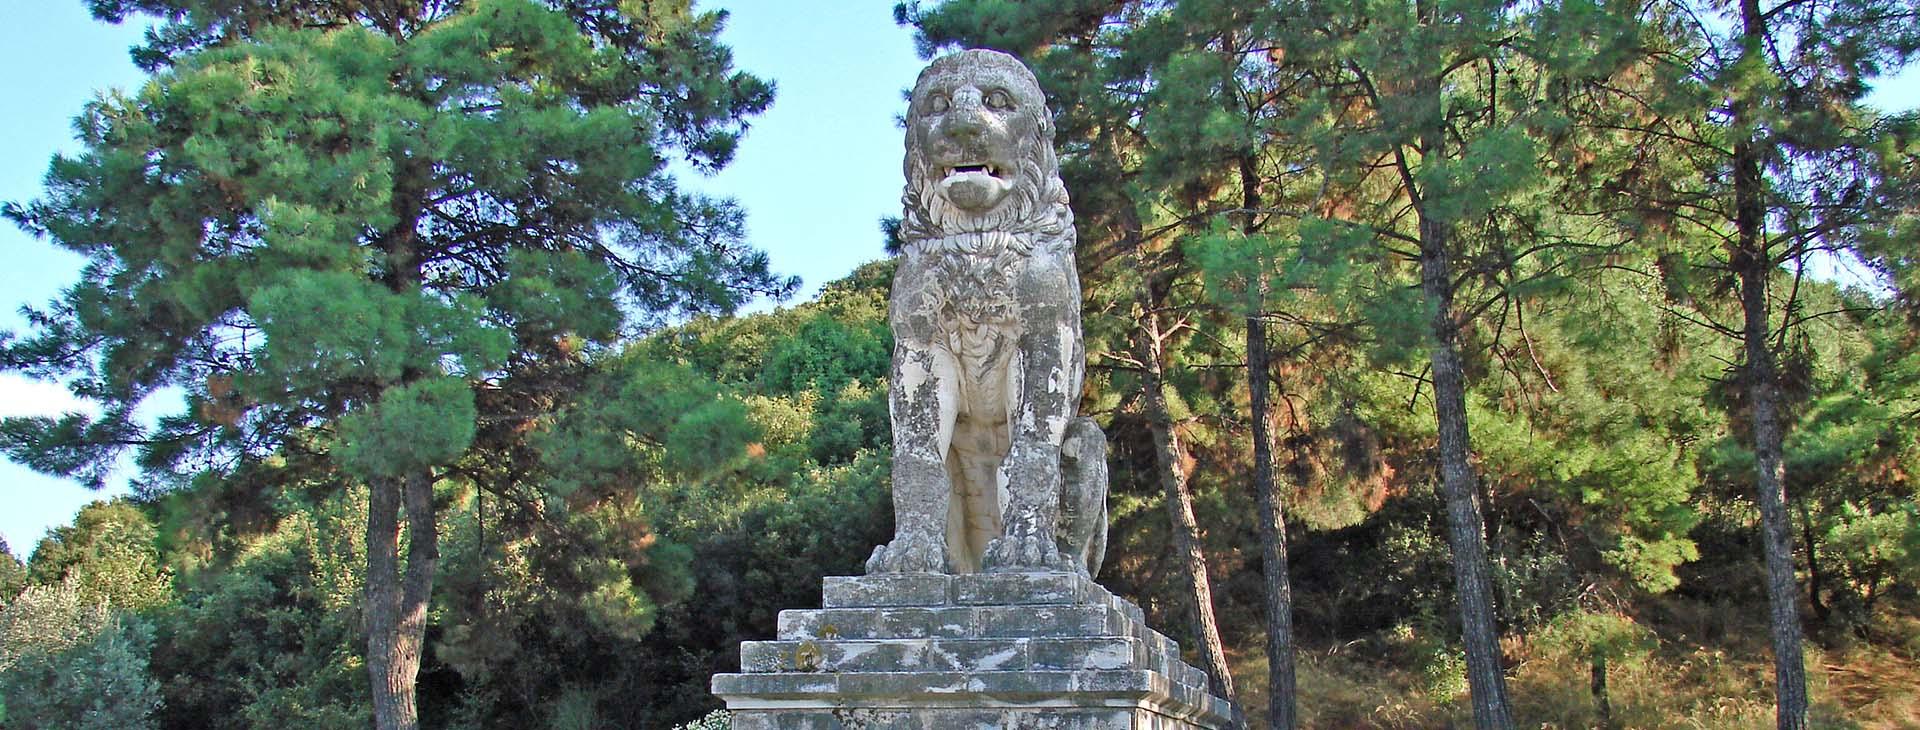 Lion of Amphipolis statue, Serres